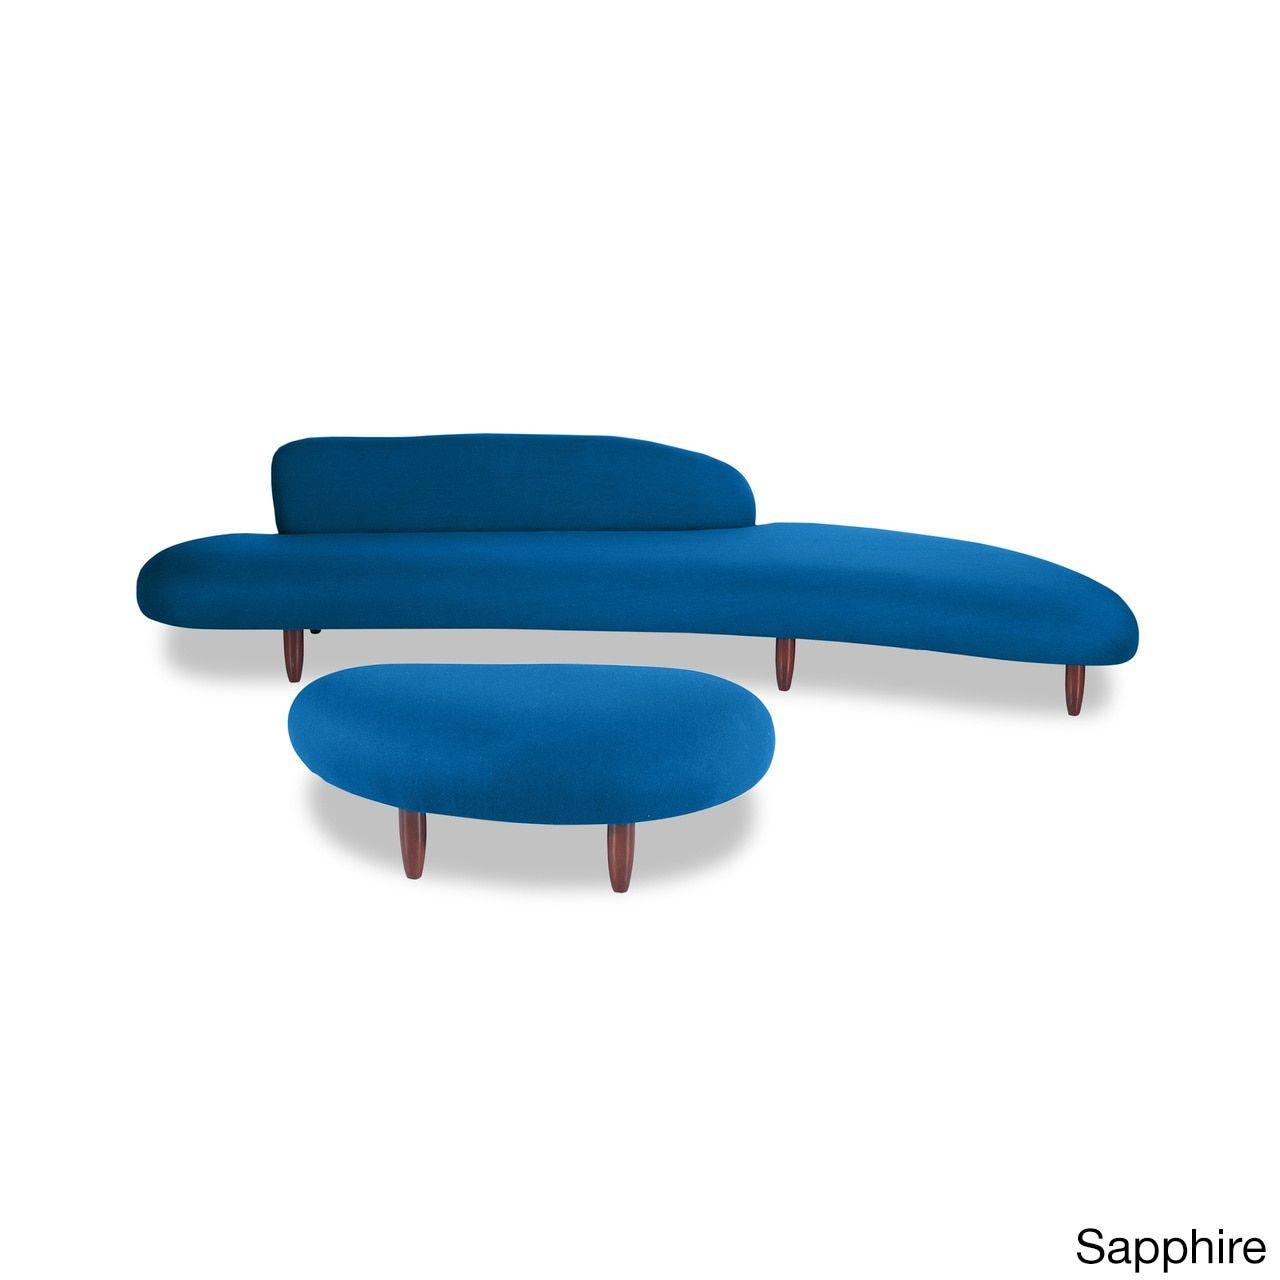 kardiel kidney bean mid century modern sofa ott cashmere wool miles redd accent table walnut legs bedside tables corner study desk contemporary floor lamps solid oak ashley